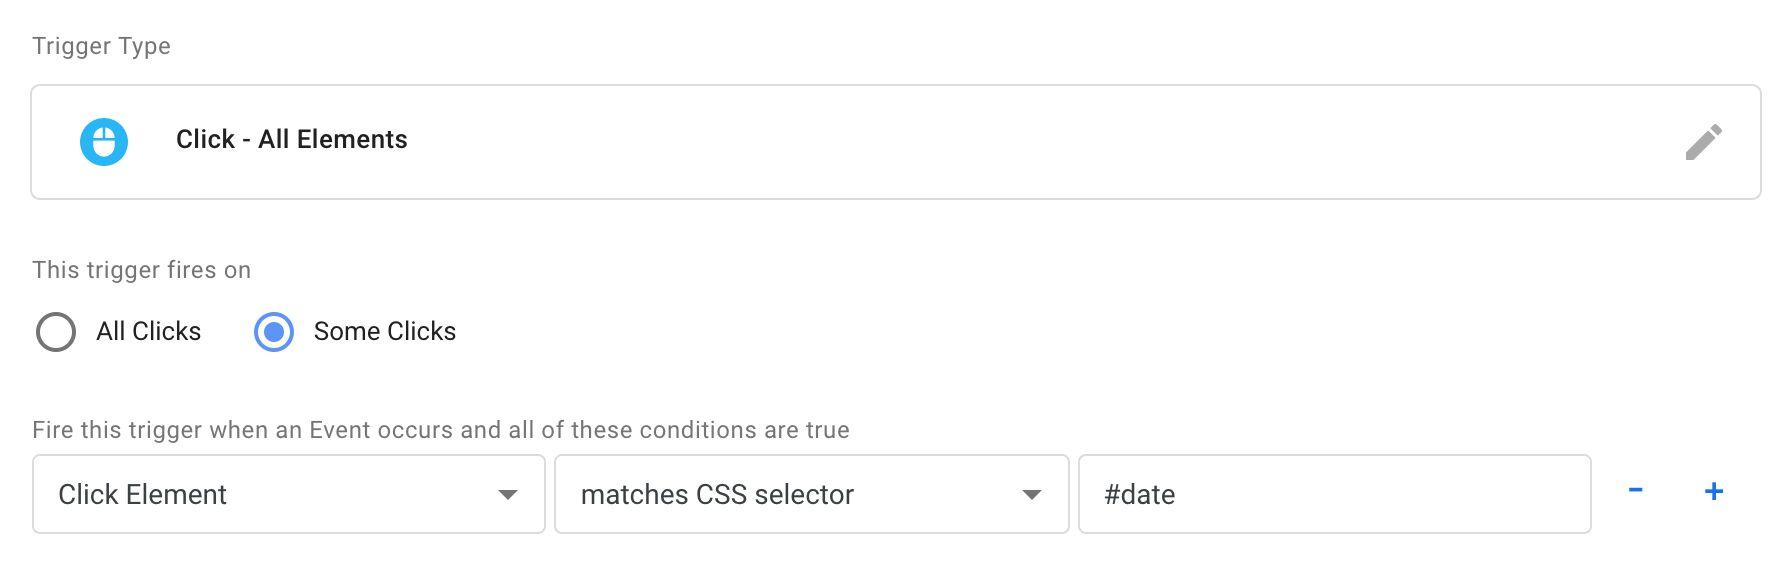 Css Selector Guide For Google Tag Manager Simo Ahava S Blog